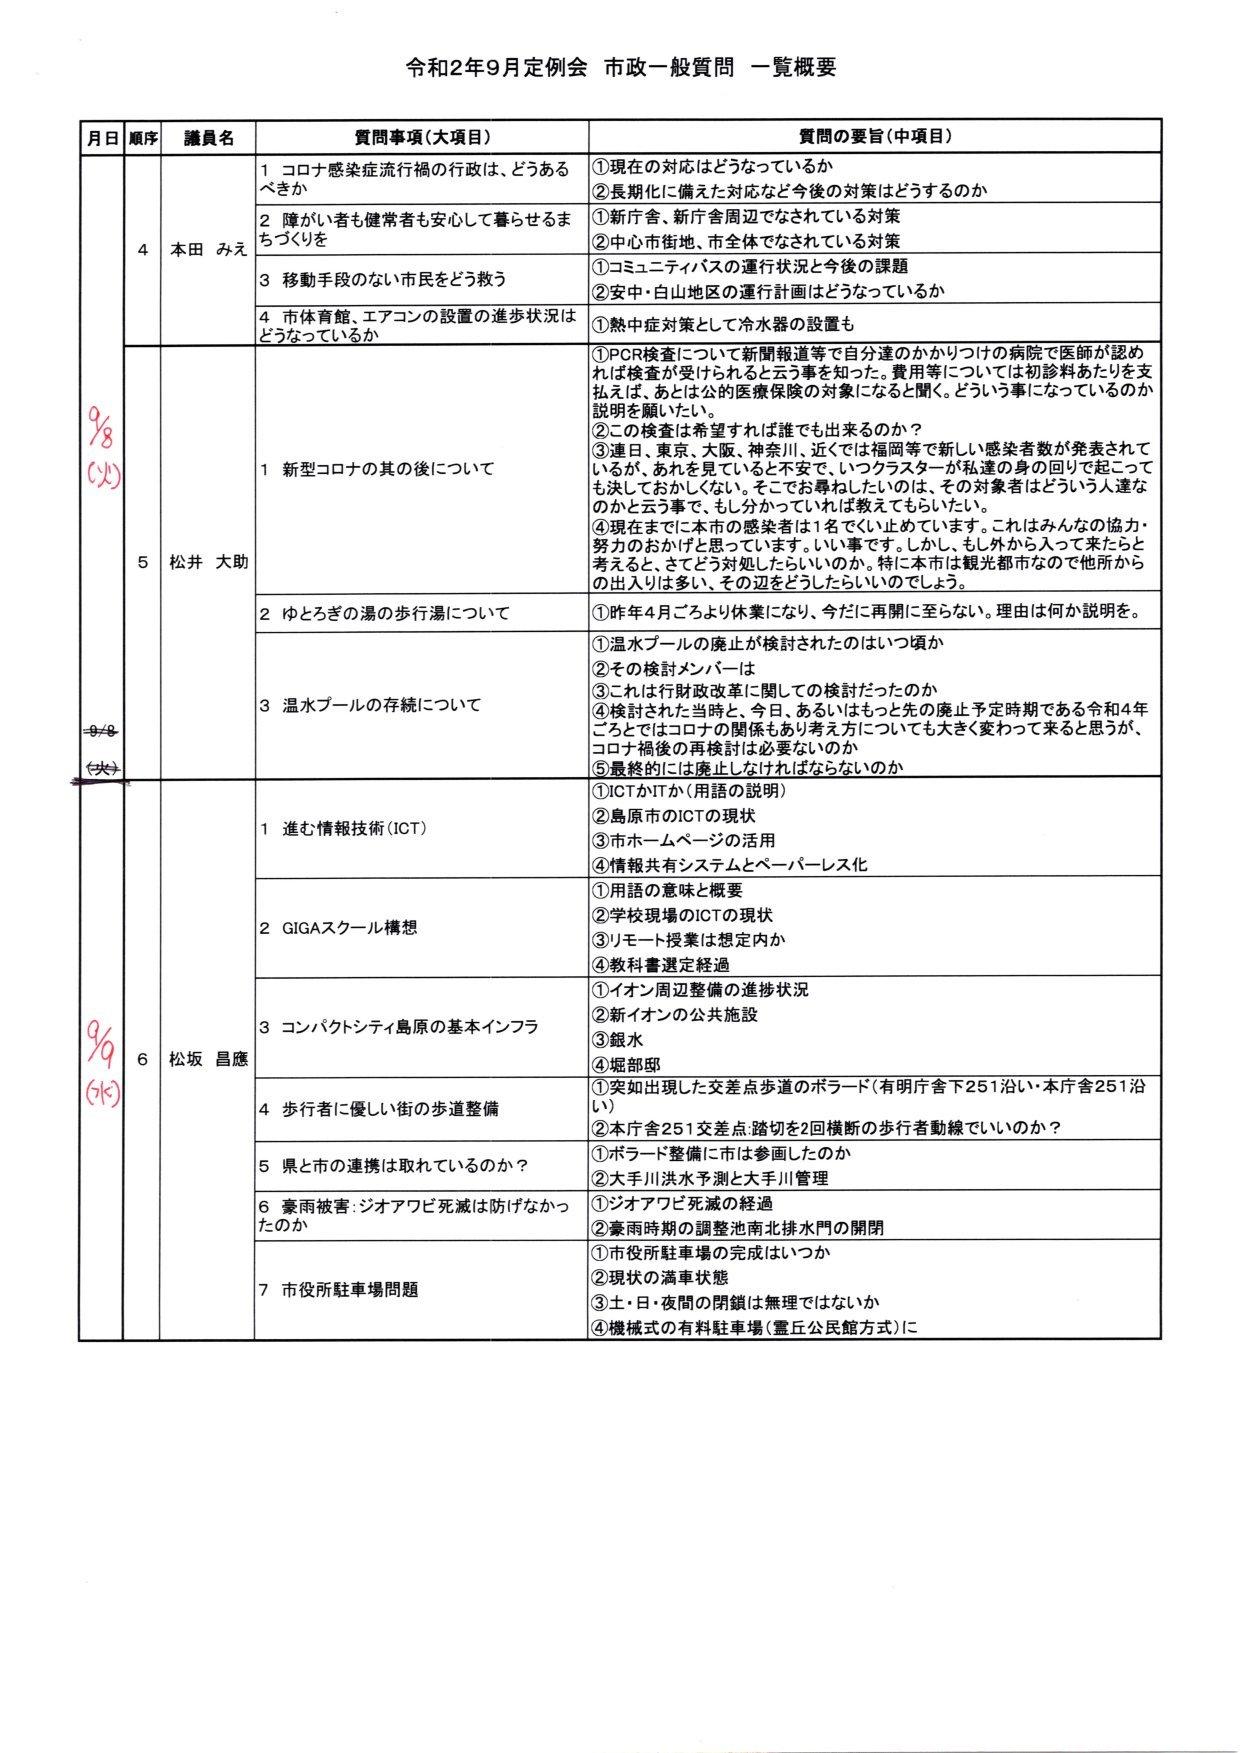 台風10号で議会日程変更_c0052876_11024151.jpg